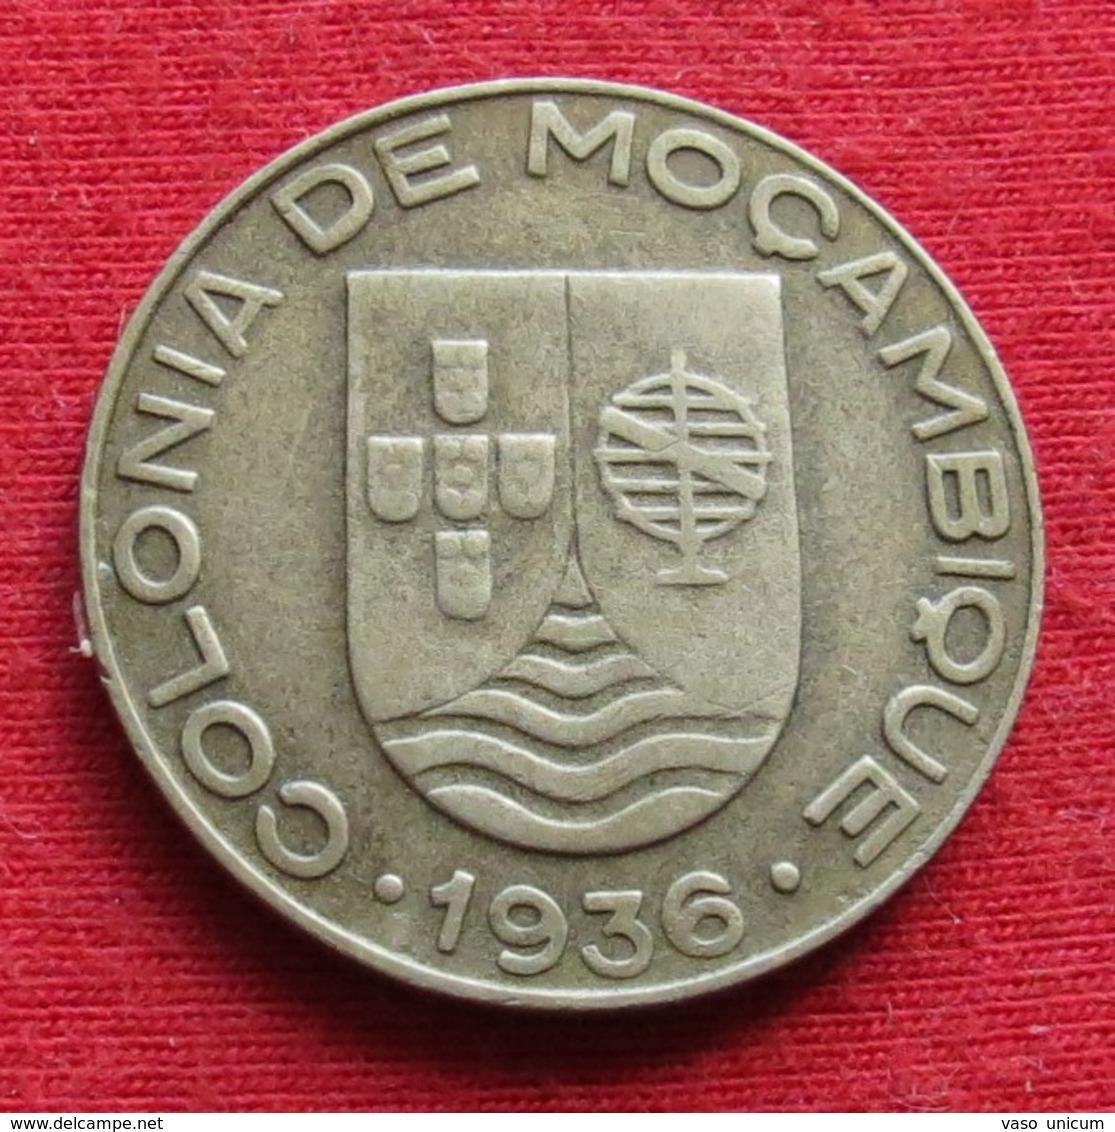 Mozambique 1 Escudo 1936 Mozambico Moçambique - Mozambique